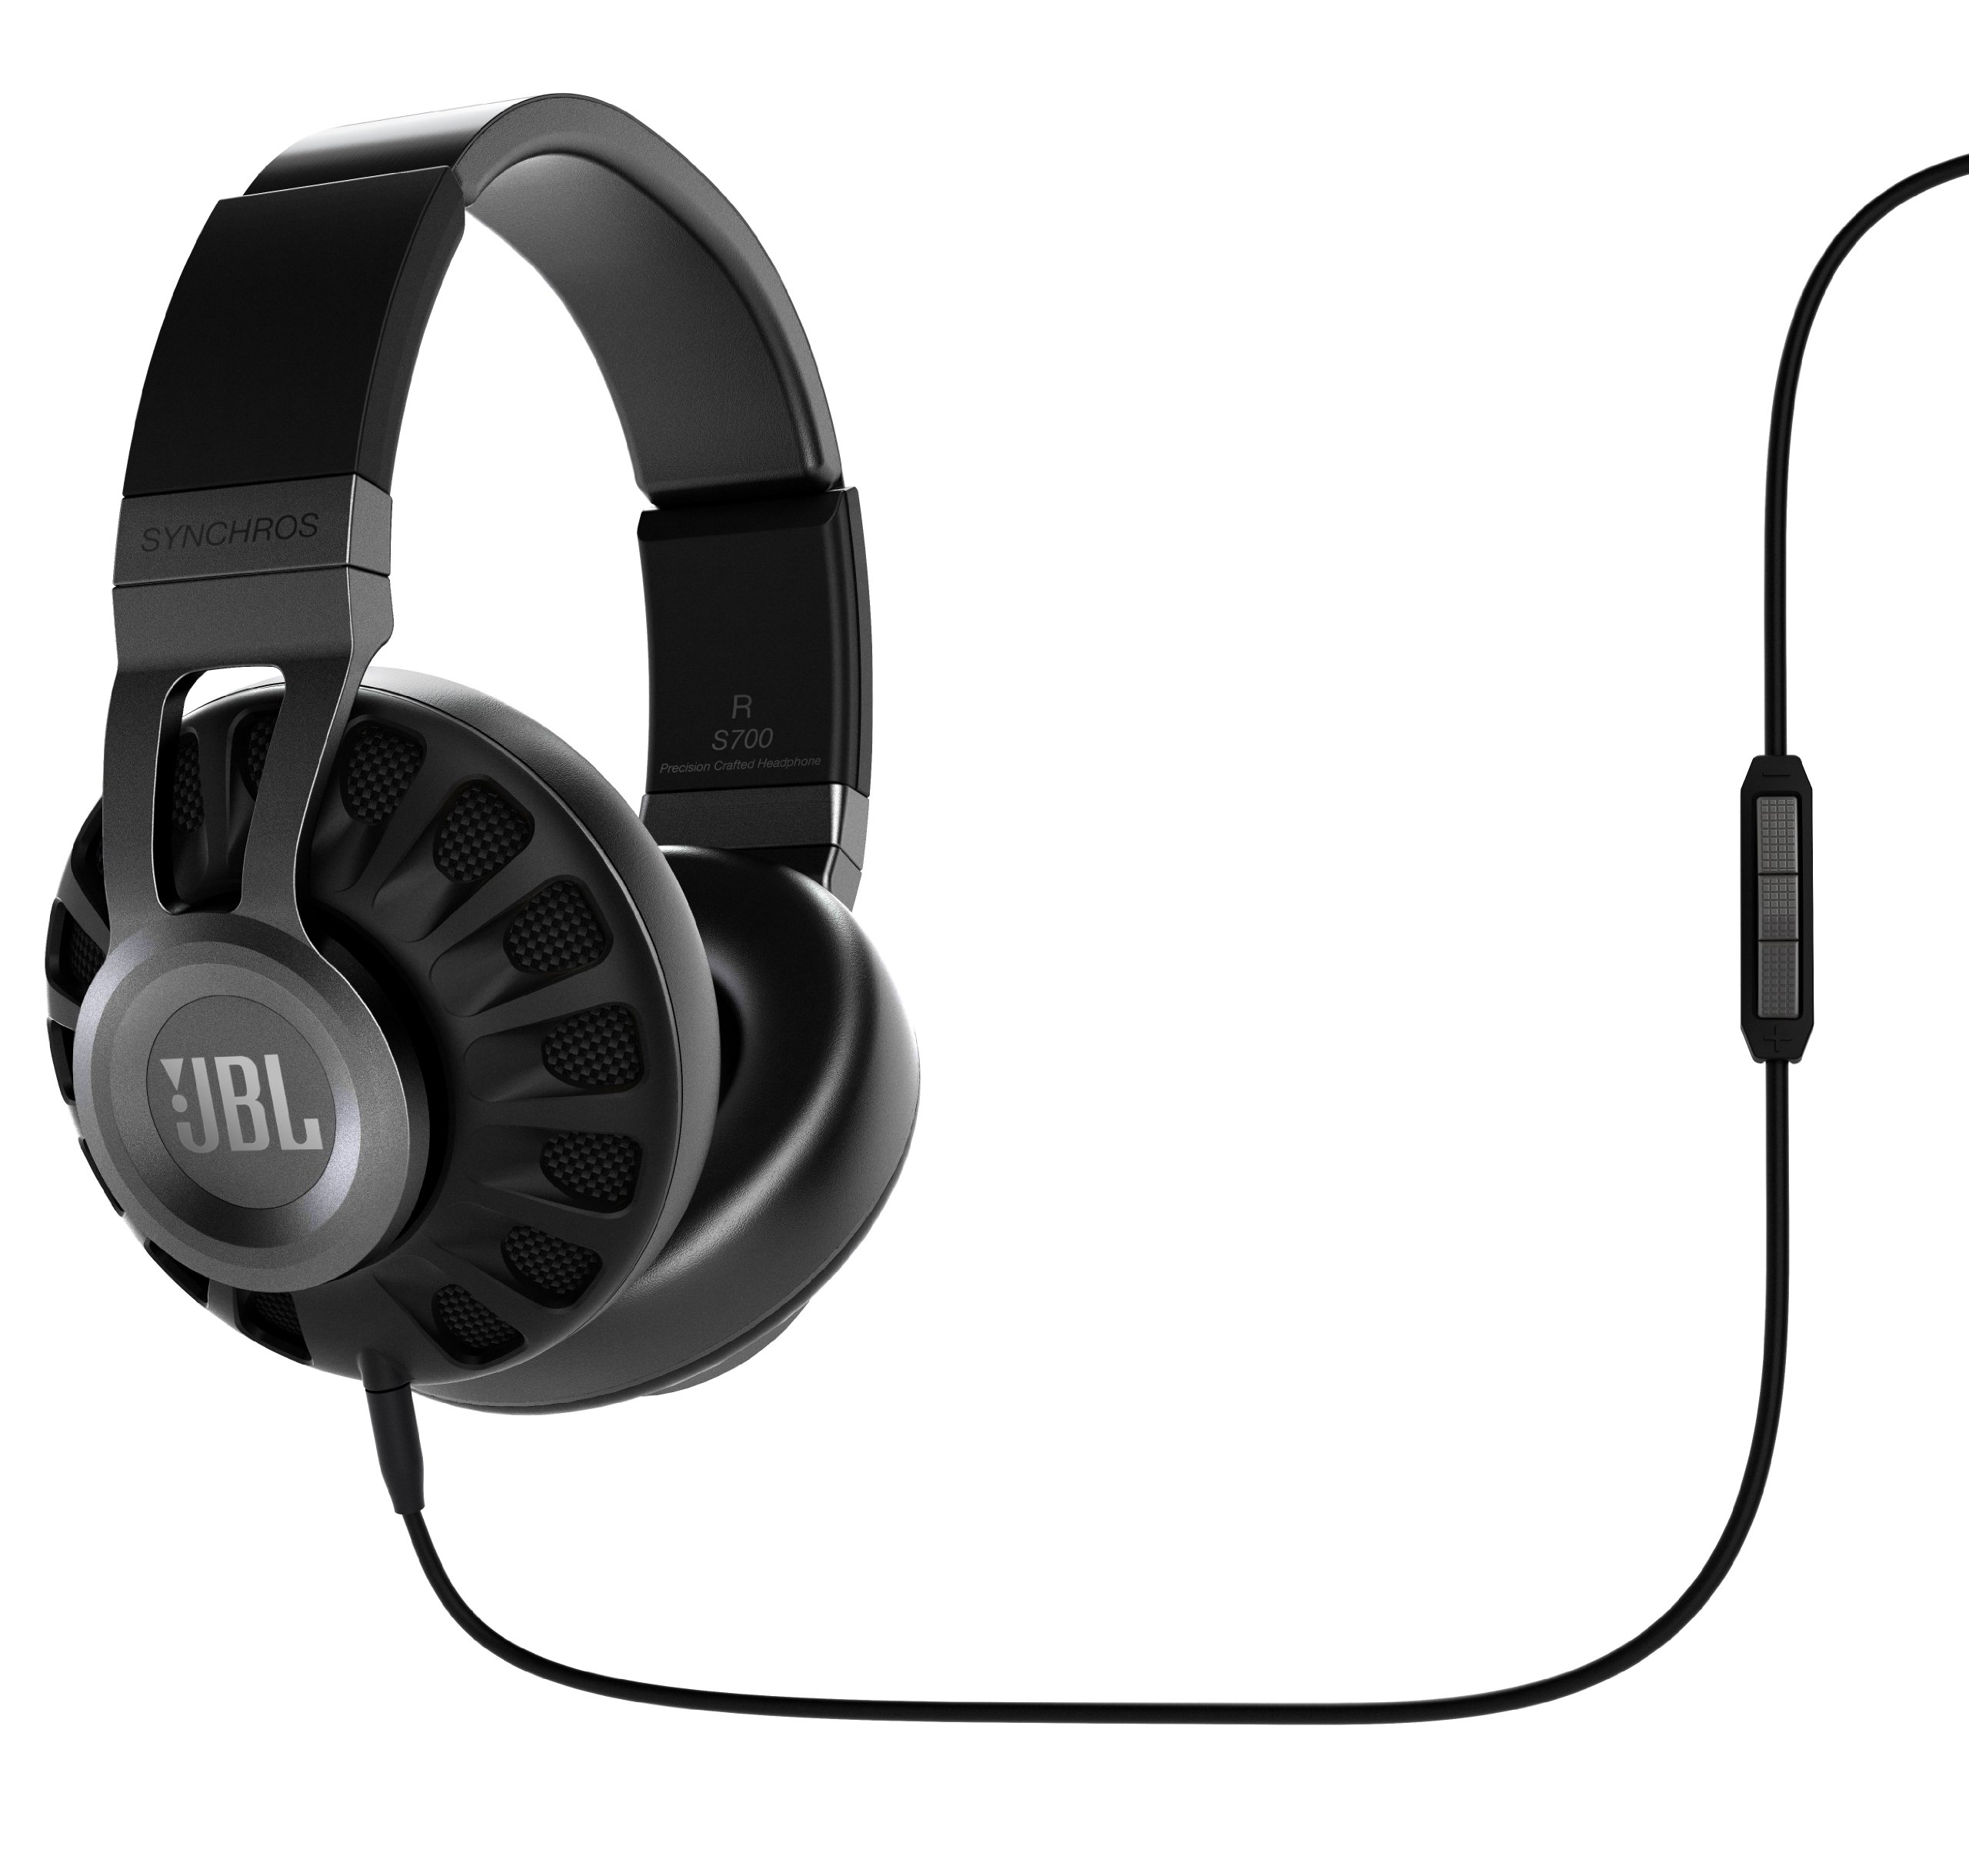 JBL Synchros S700 Premium Powered Over-Ear Stereo Headphones, Black by JBL